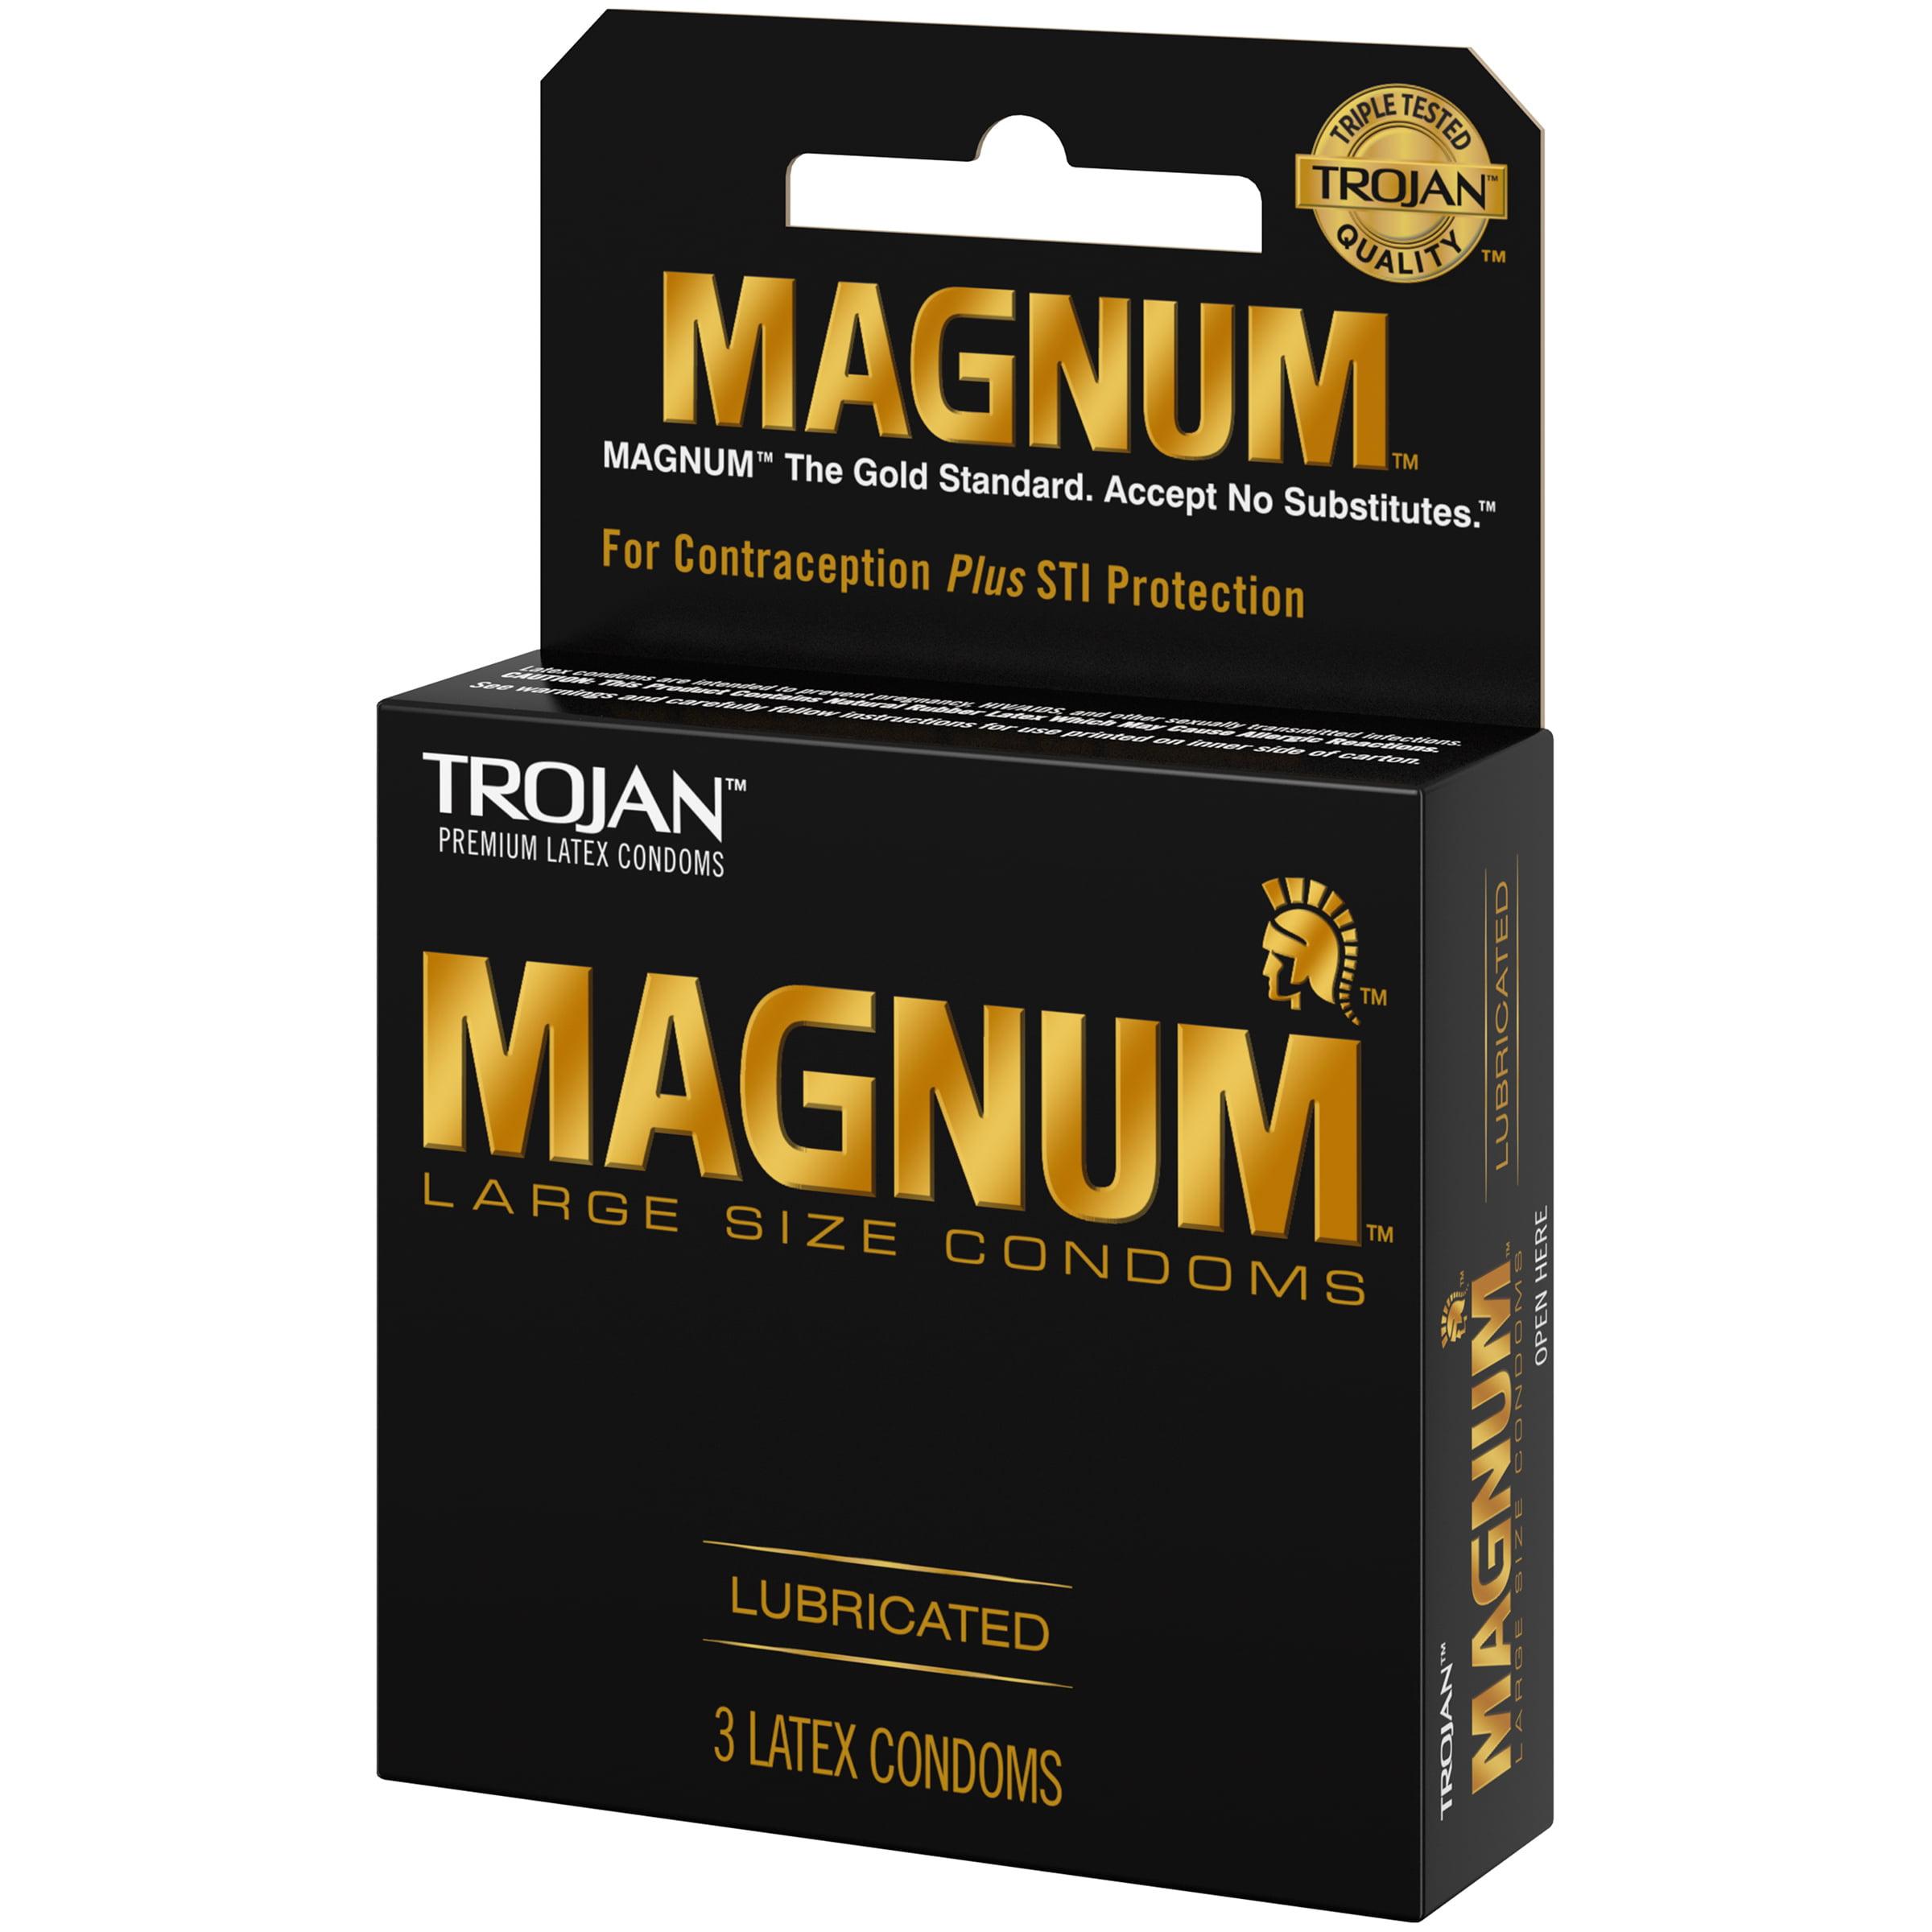 Trojan Magnum Large Size Lubricated Latex Condoms - 3 ct